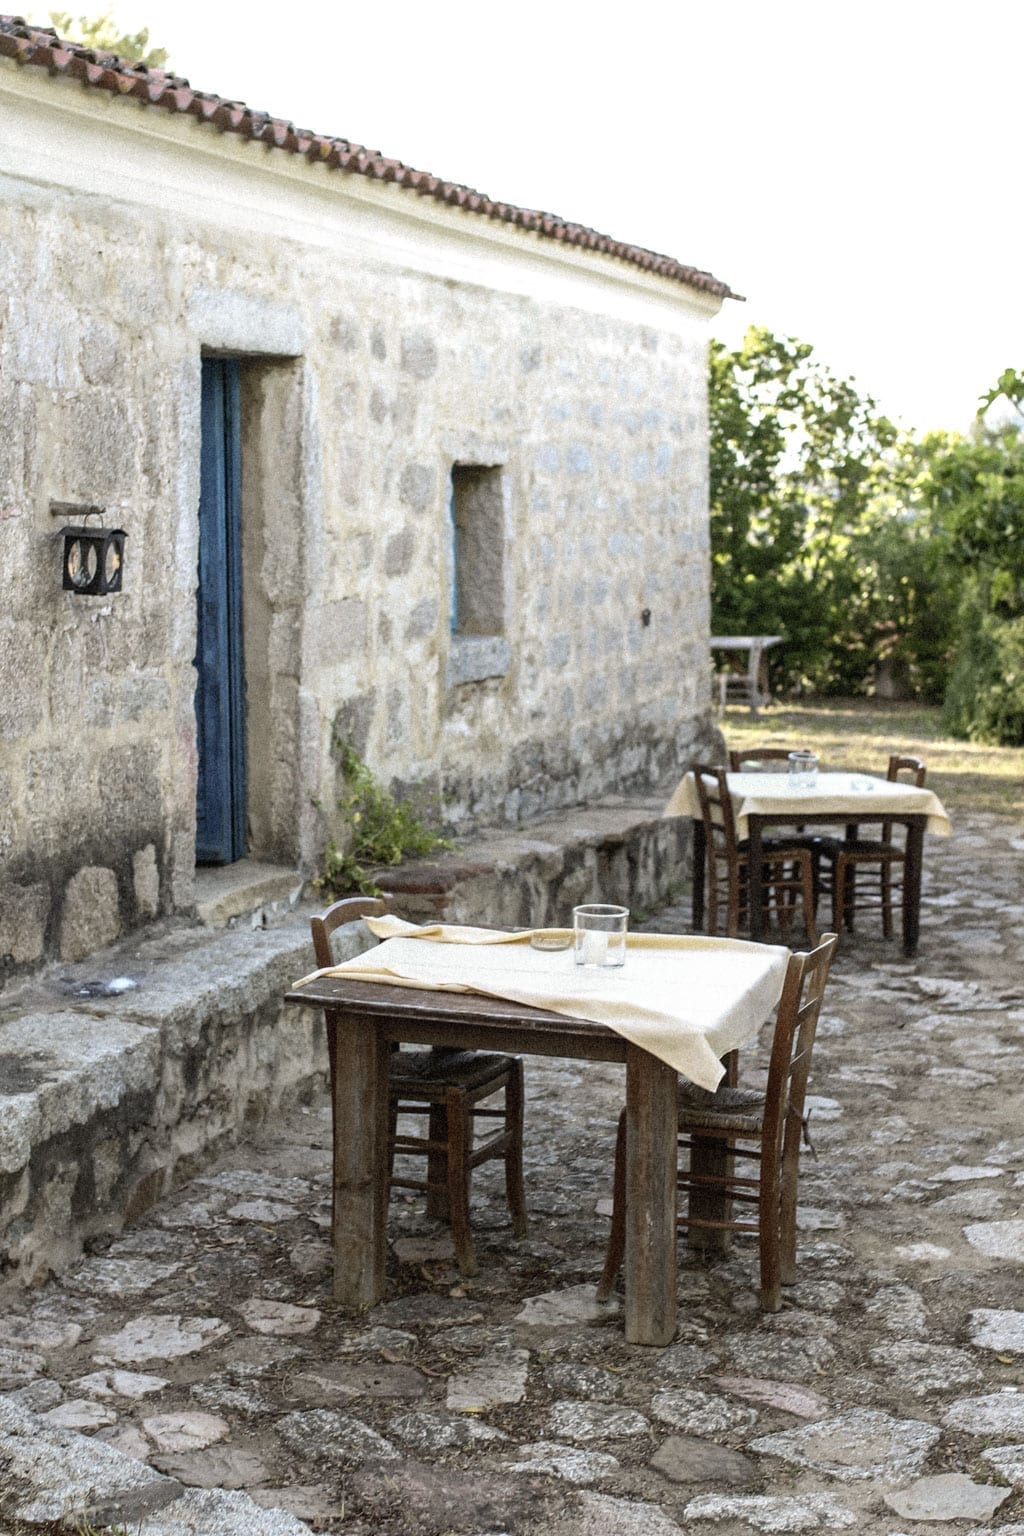 CK-1606_Sardinien-Sardegna-Sardinia-Italy-Italia-Fashion-Blog-Sun-Down-Dress-Blonde-Karin-Kaswurm-9596